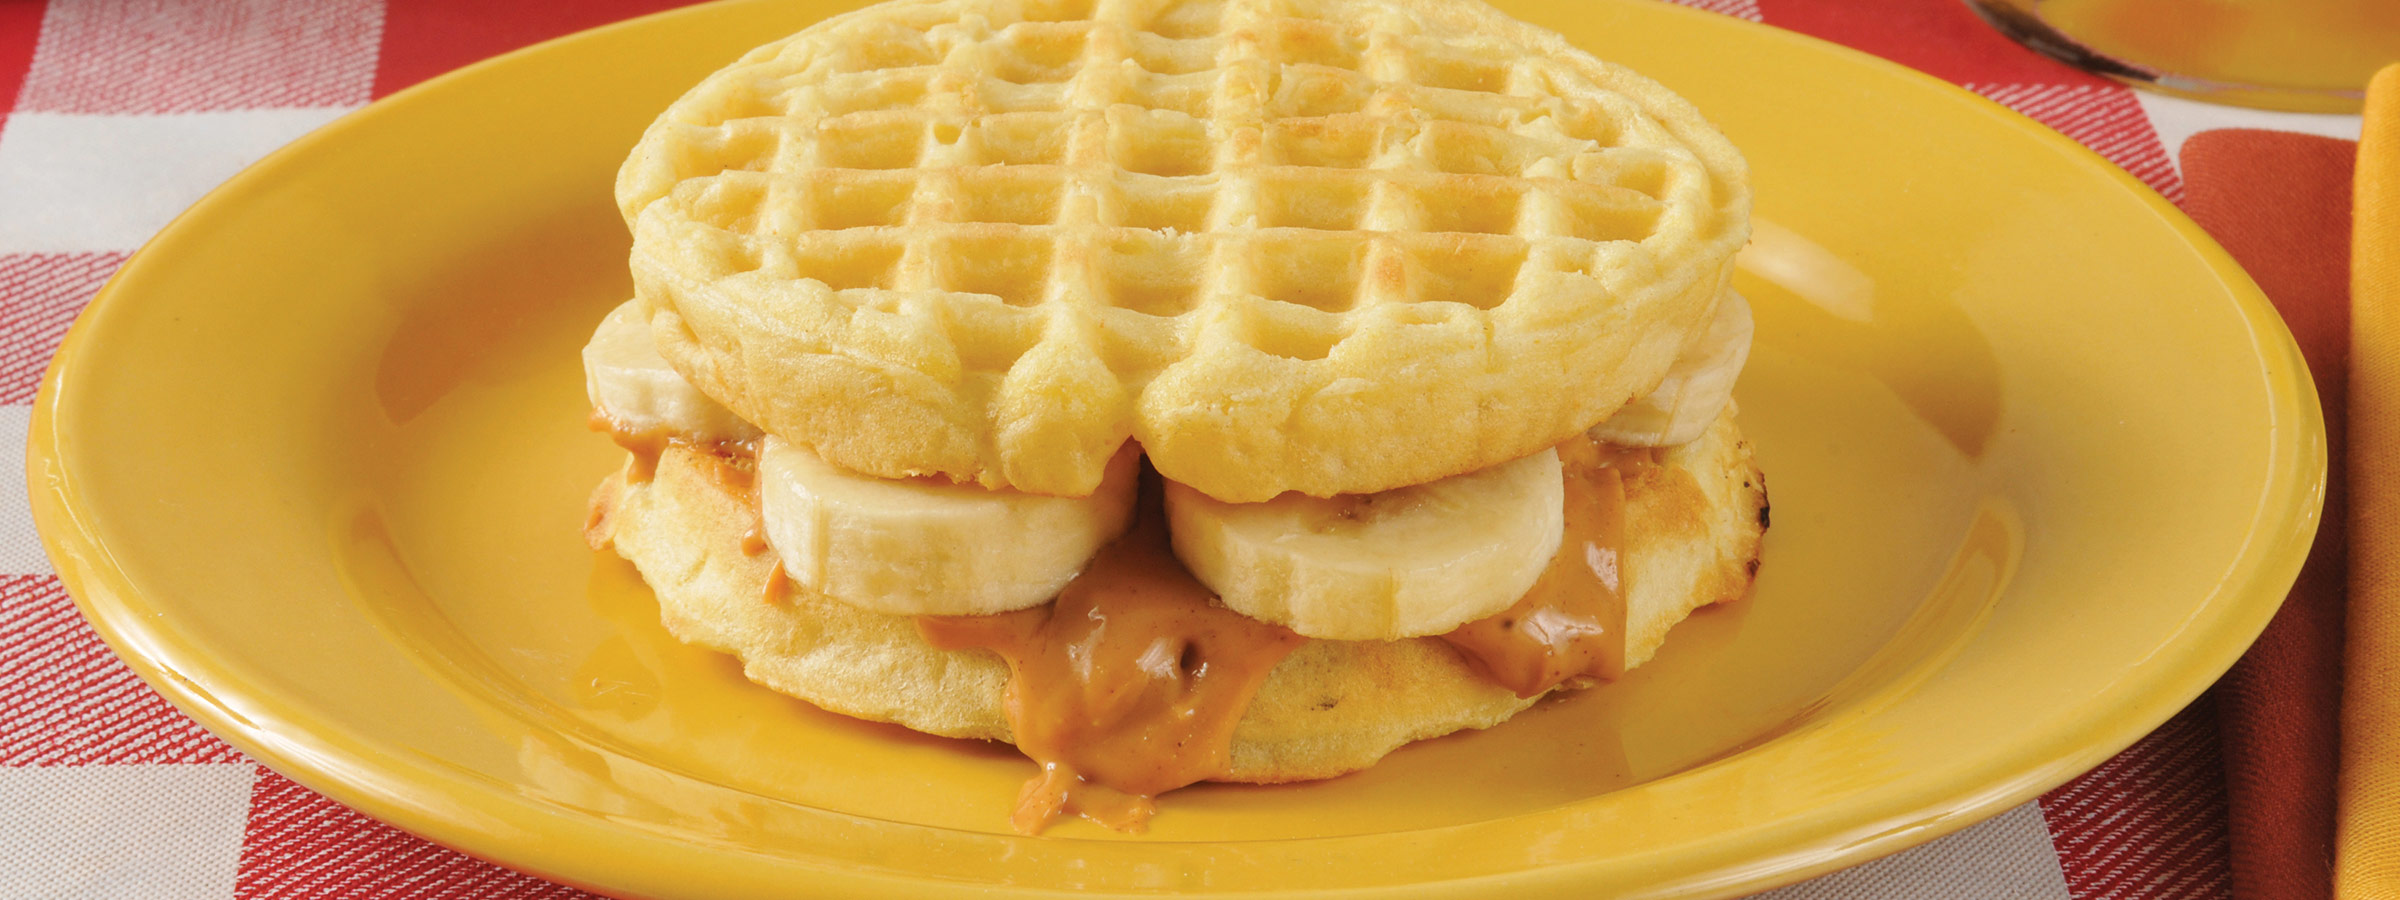 banana and almond waffles image